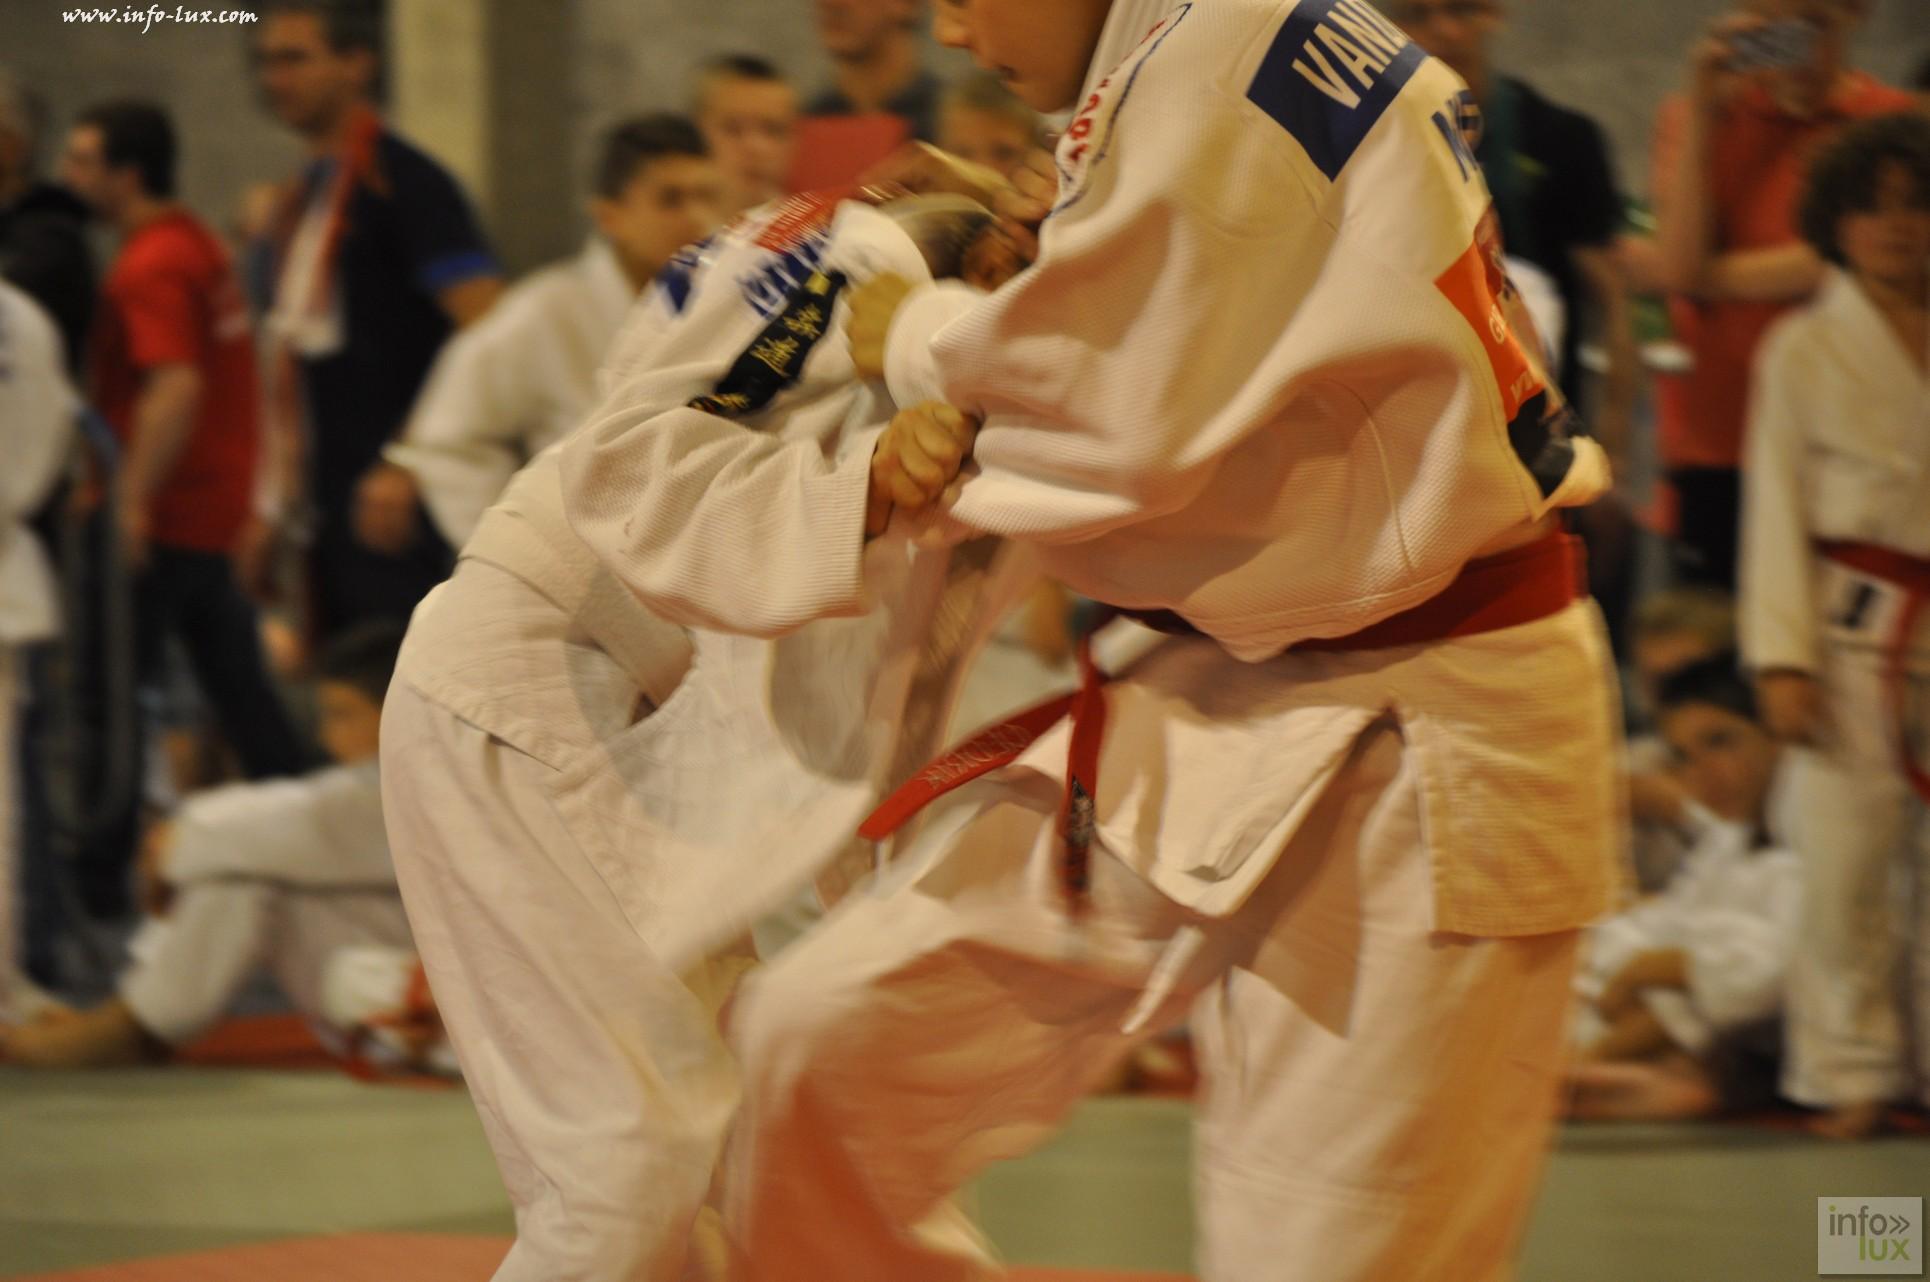 images/stories/PHOTOSREP/Bastogne/judo/Judo-Basto65